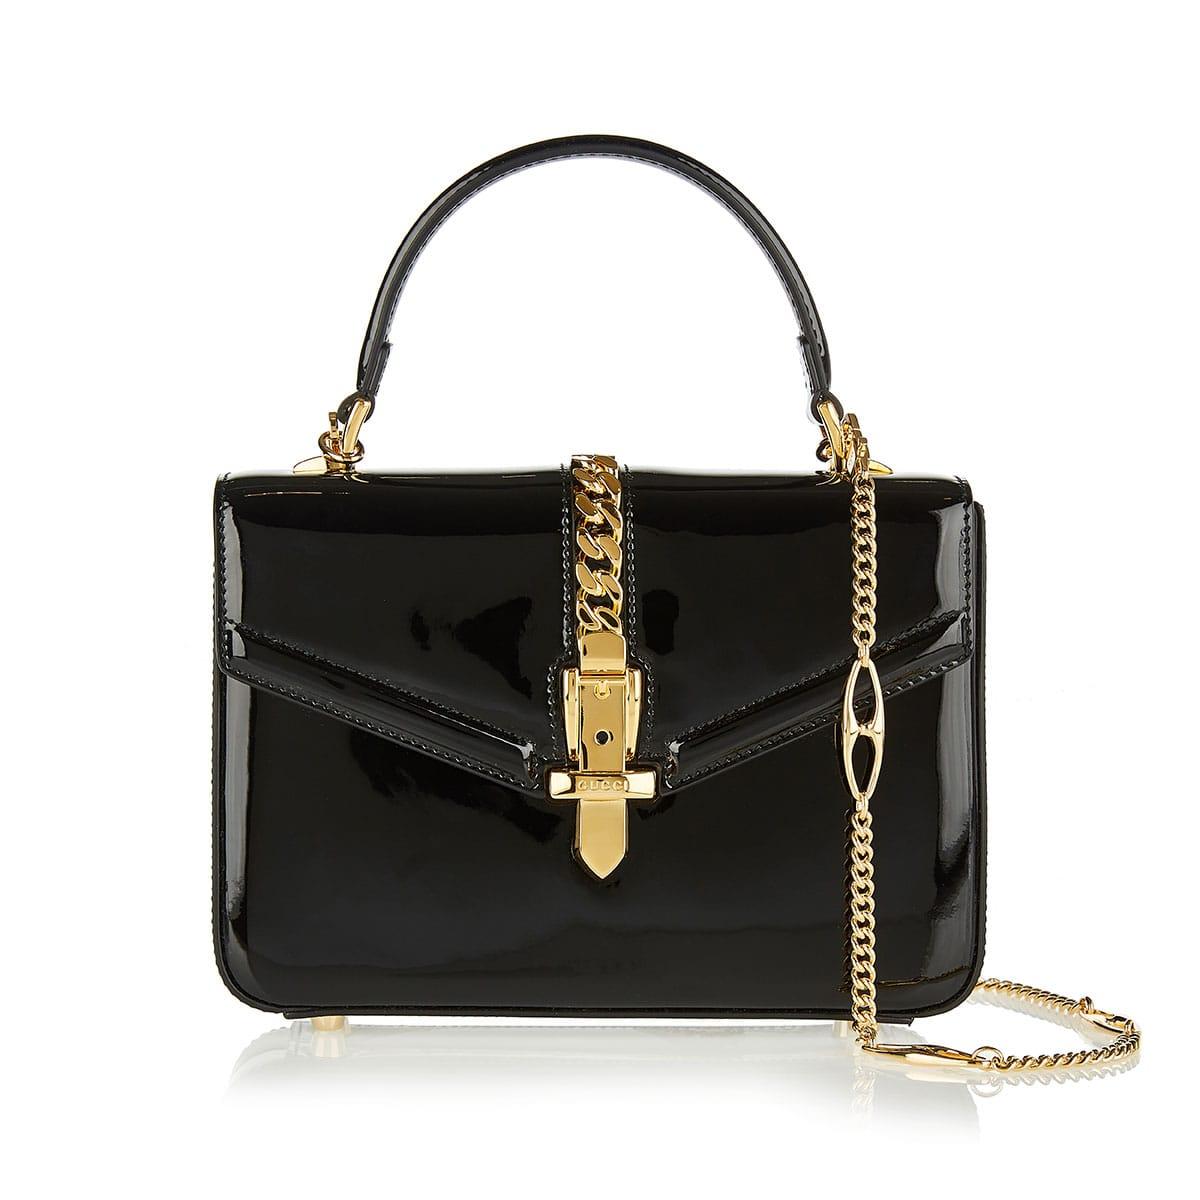 Sylvie 1969 patent leather mini bag